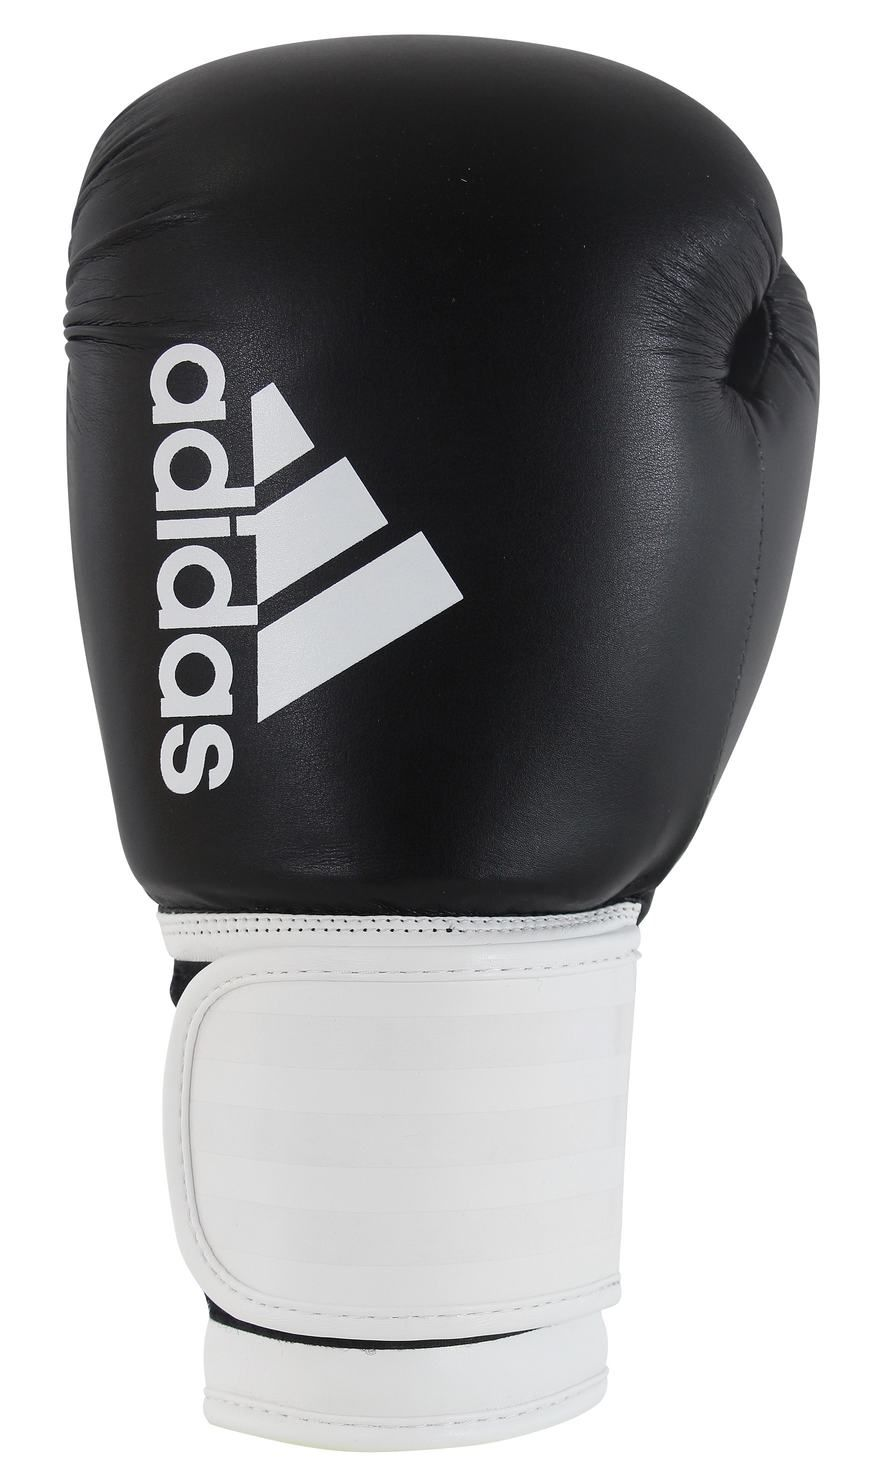 Luva de Boxe Adidas Hybrid100 Branca/Preta